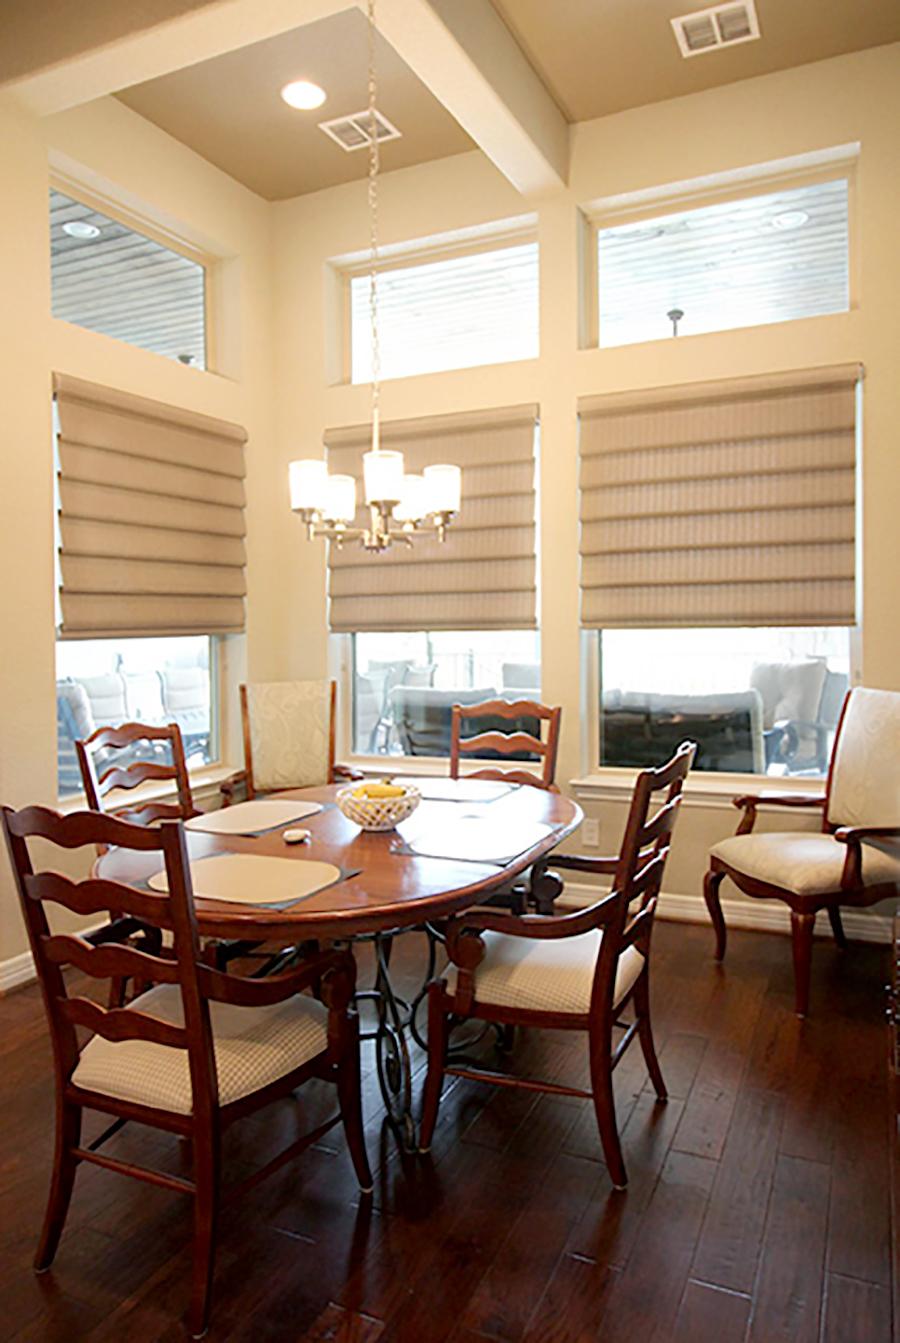 tiffany hartnett designer top picks vignette modern roman shades Hunter Douglas energy efficient window treatments San Antonio 78249